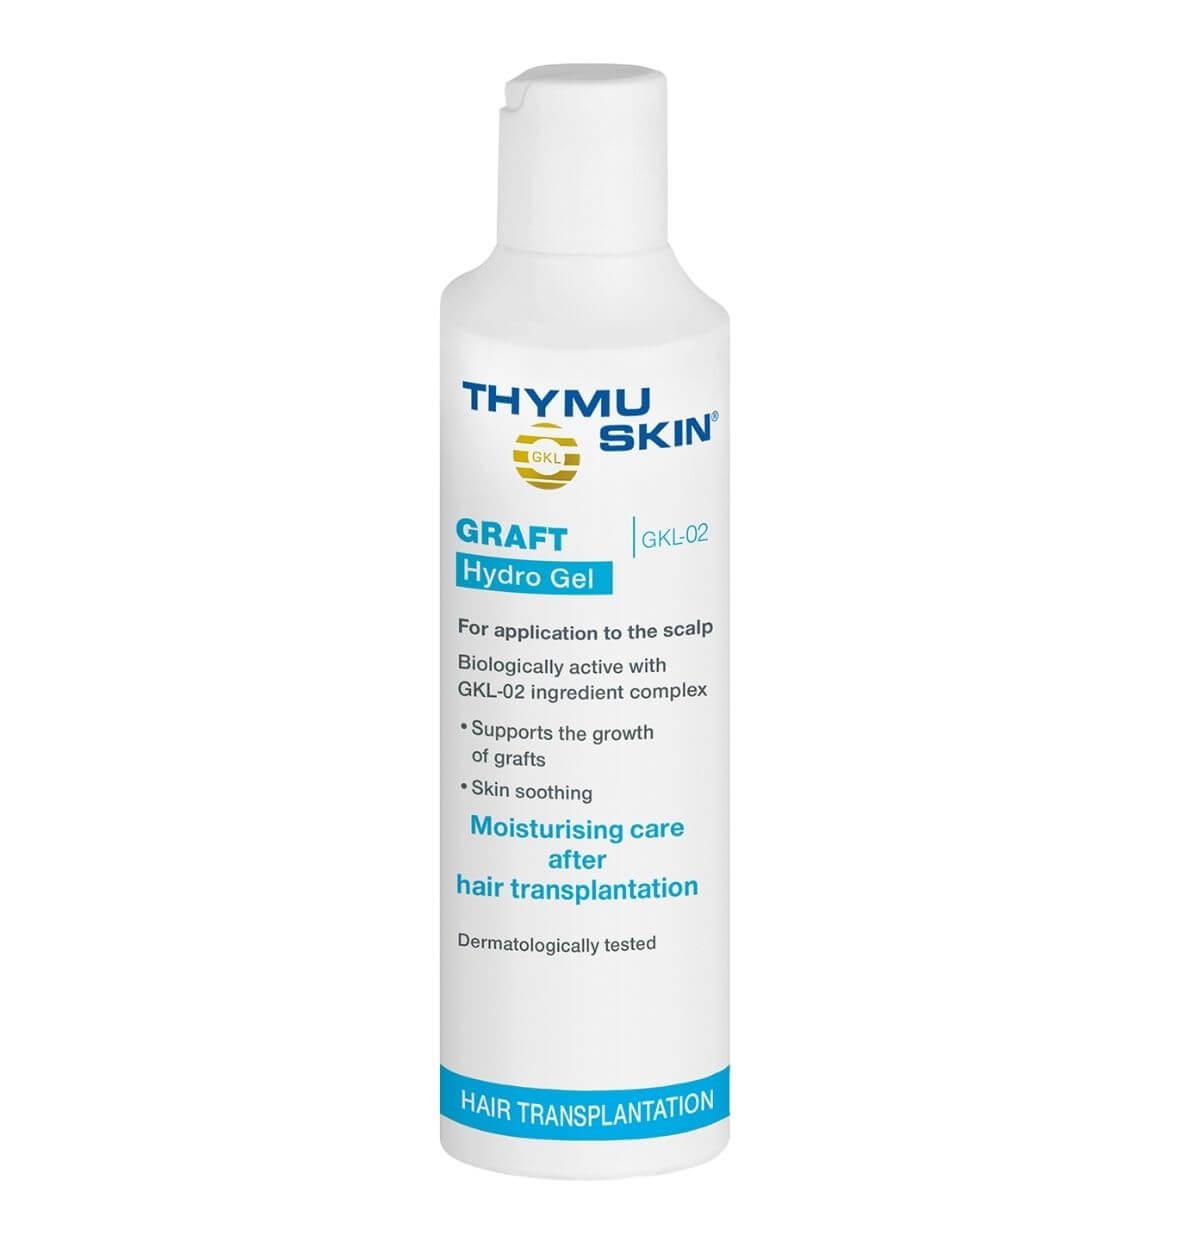 Thymuskin Hydro Gel